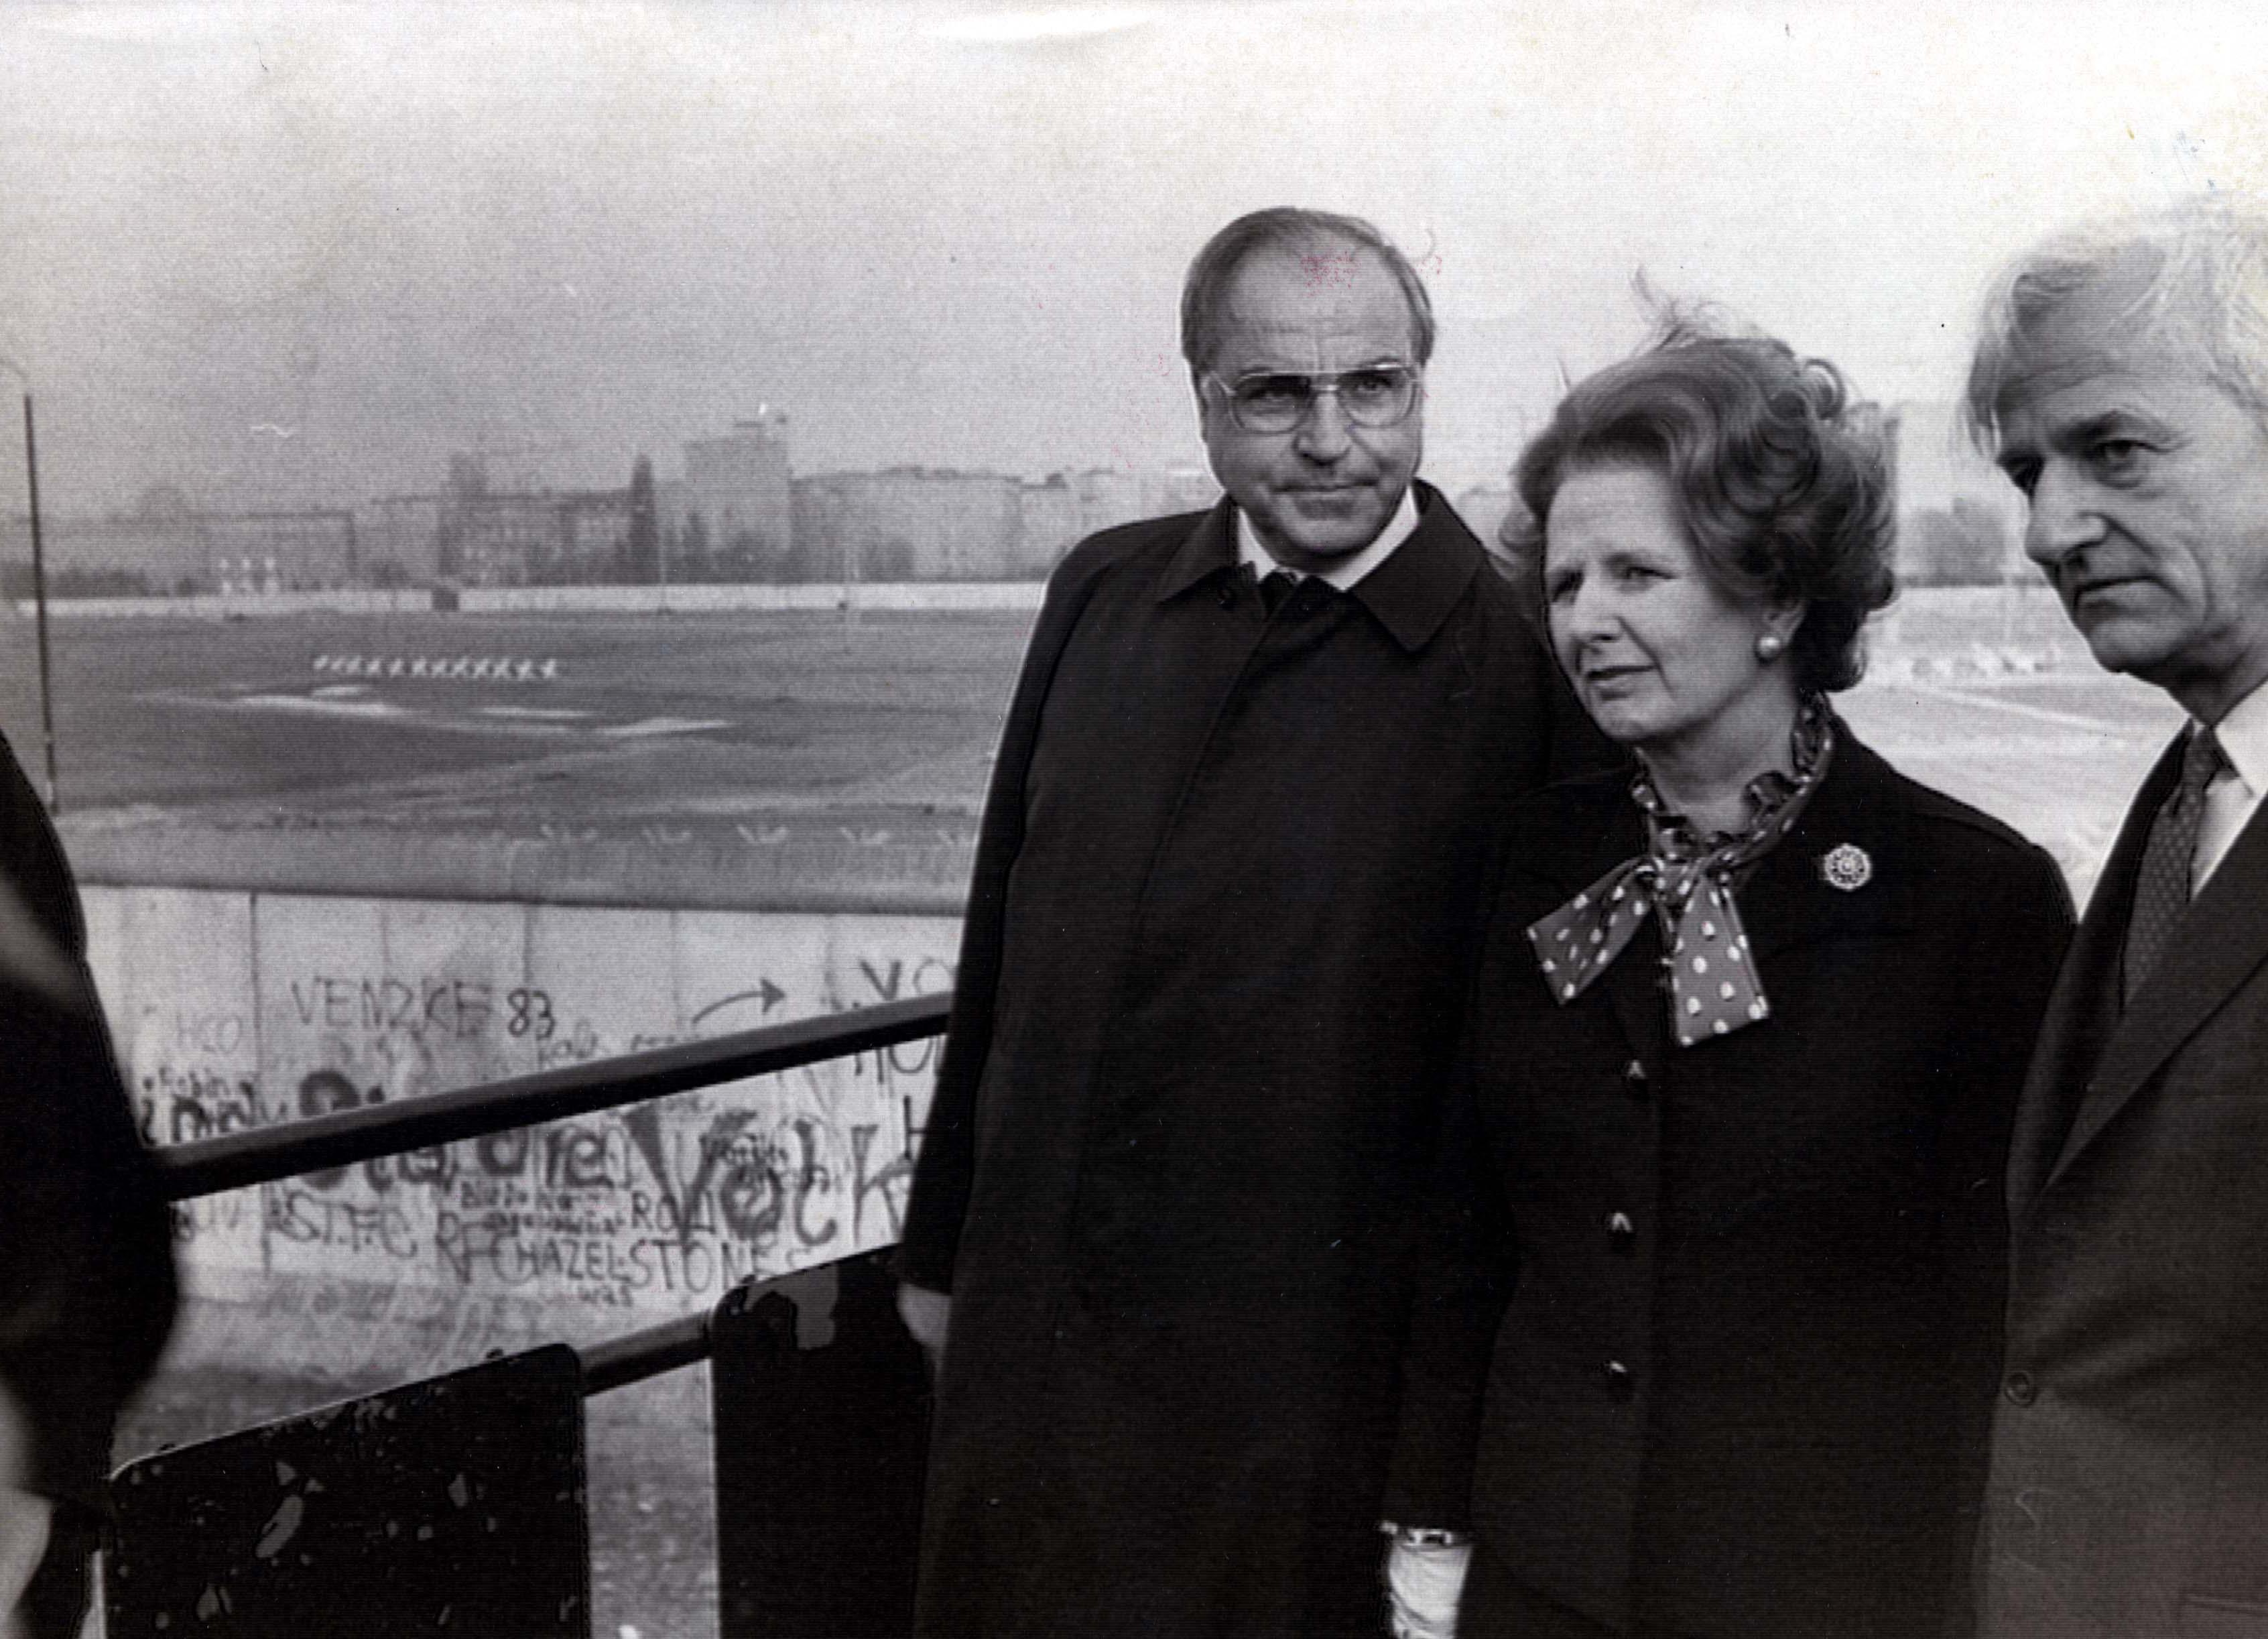 La premier bitánica Margaret Thatcher junto al Muro de Berlín en 1982.